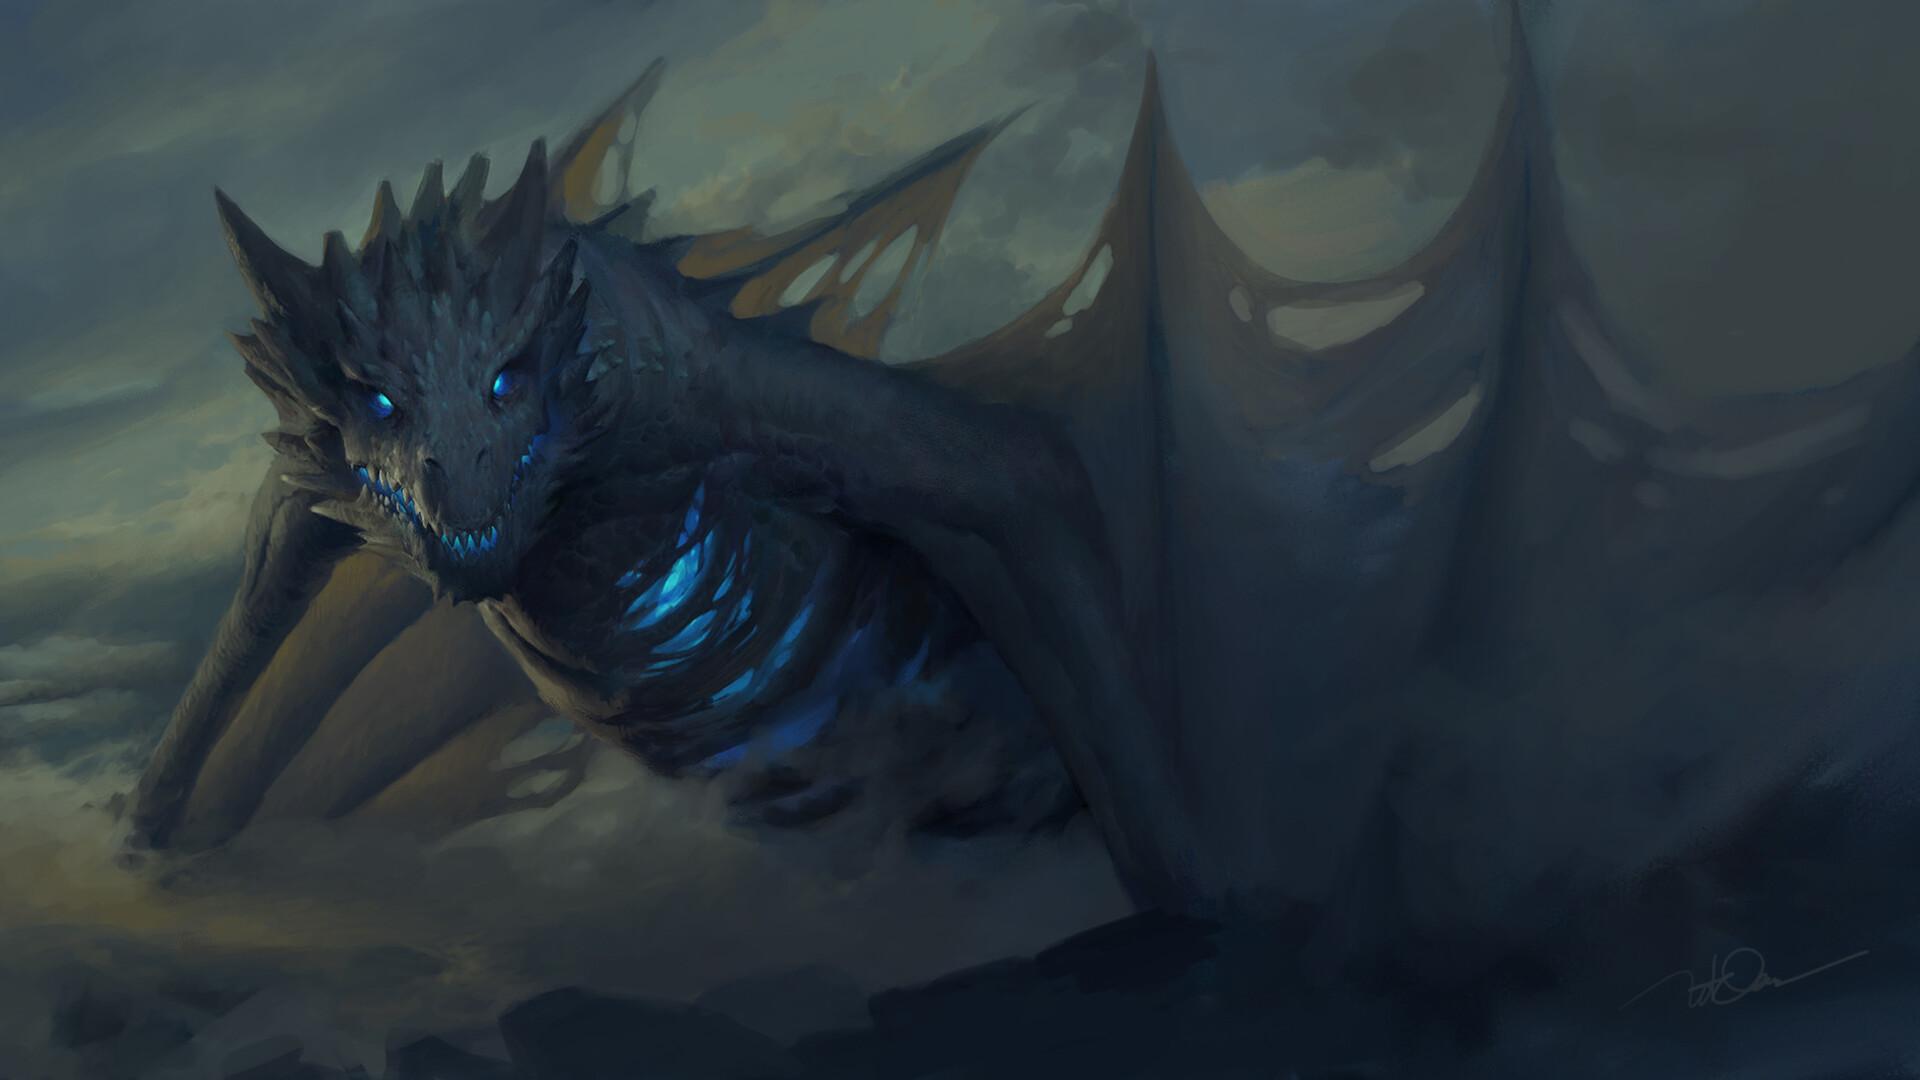 Dragon Game Of Thrones Artwork Ro